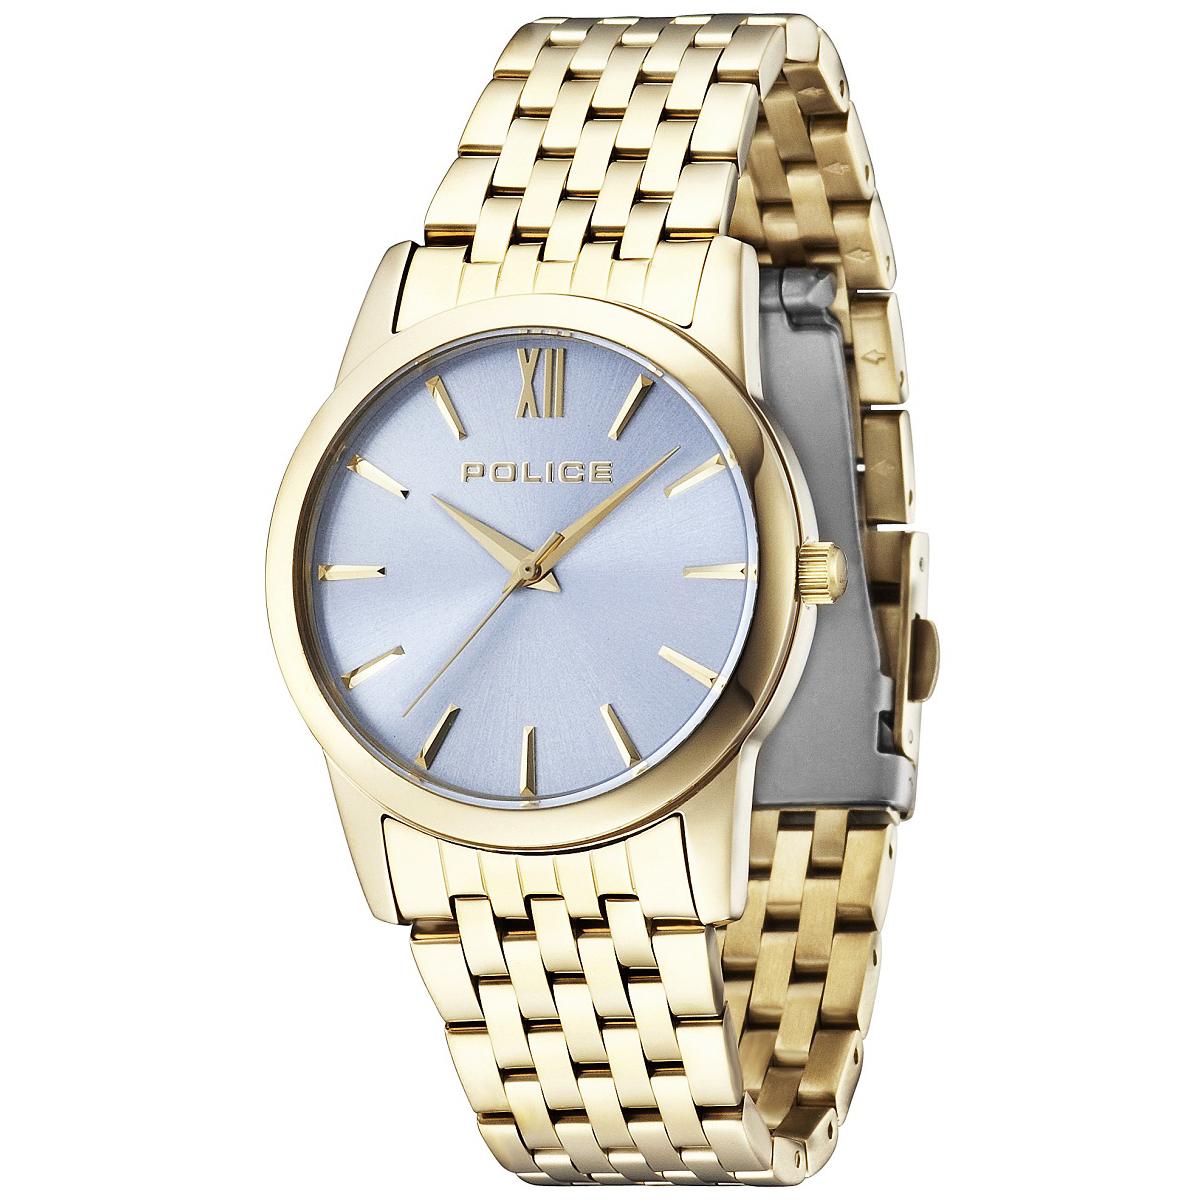 POLICE(ポリス)腕時計 CELEBRASHONセレブレーション アイスブルー/ゴールド【14495MSG-08M】